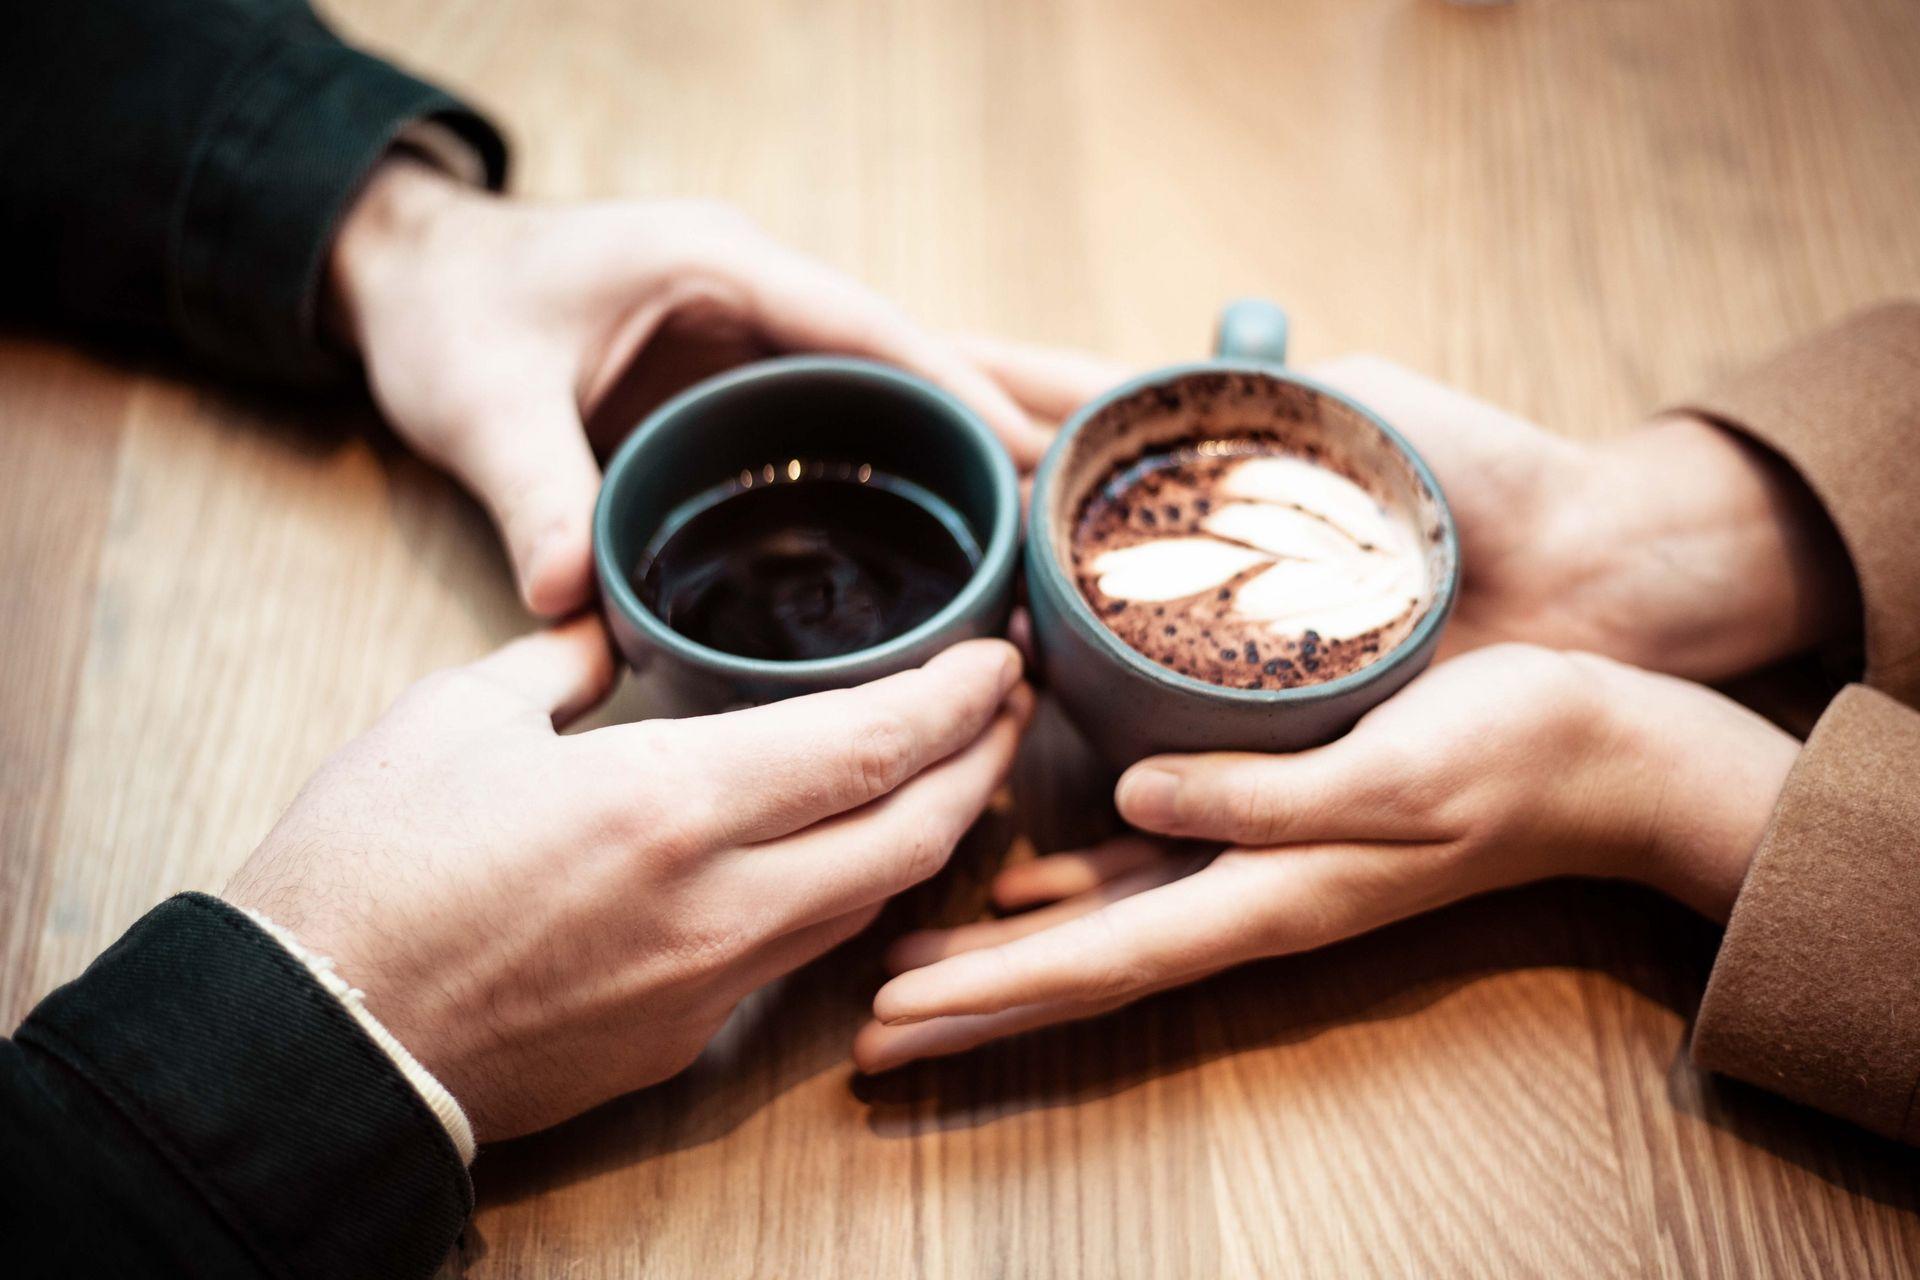 Pärchen trinkt gemeinsam Kaffee